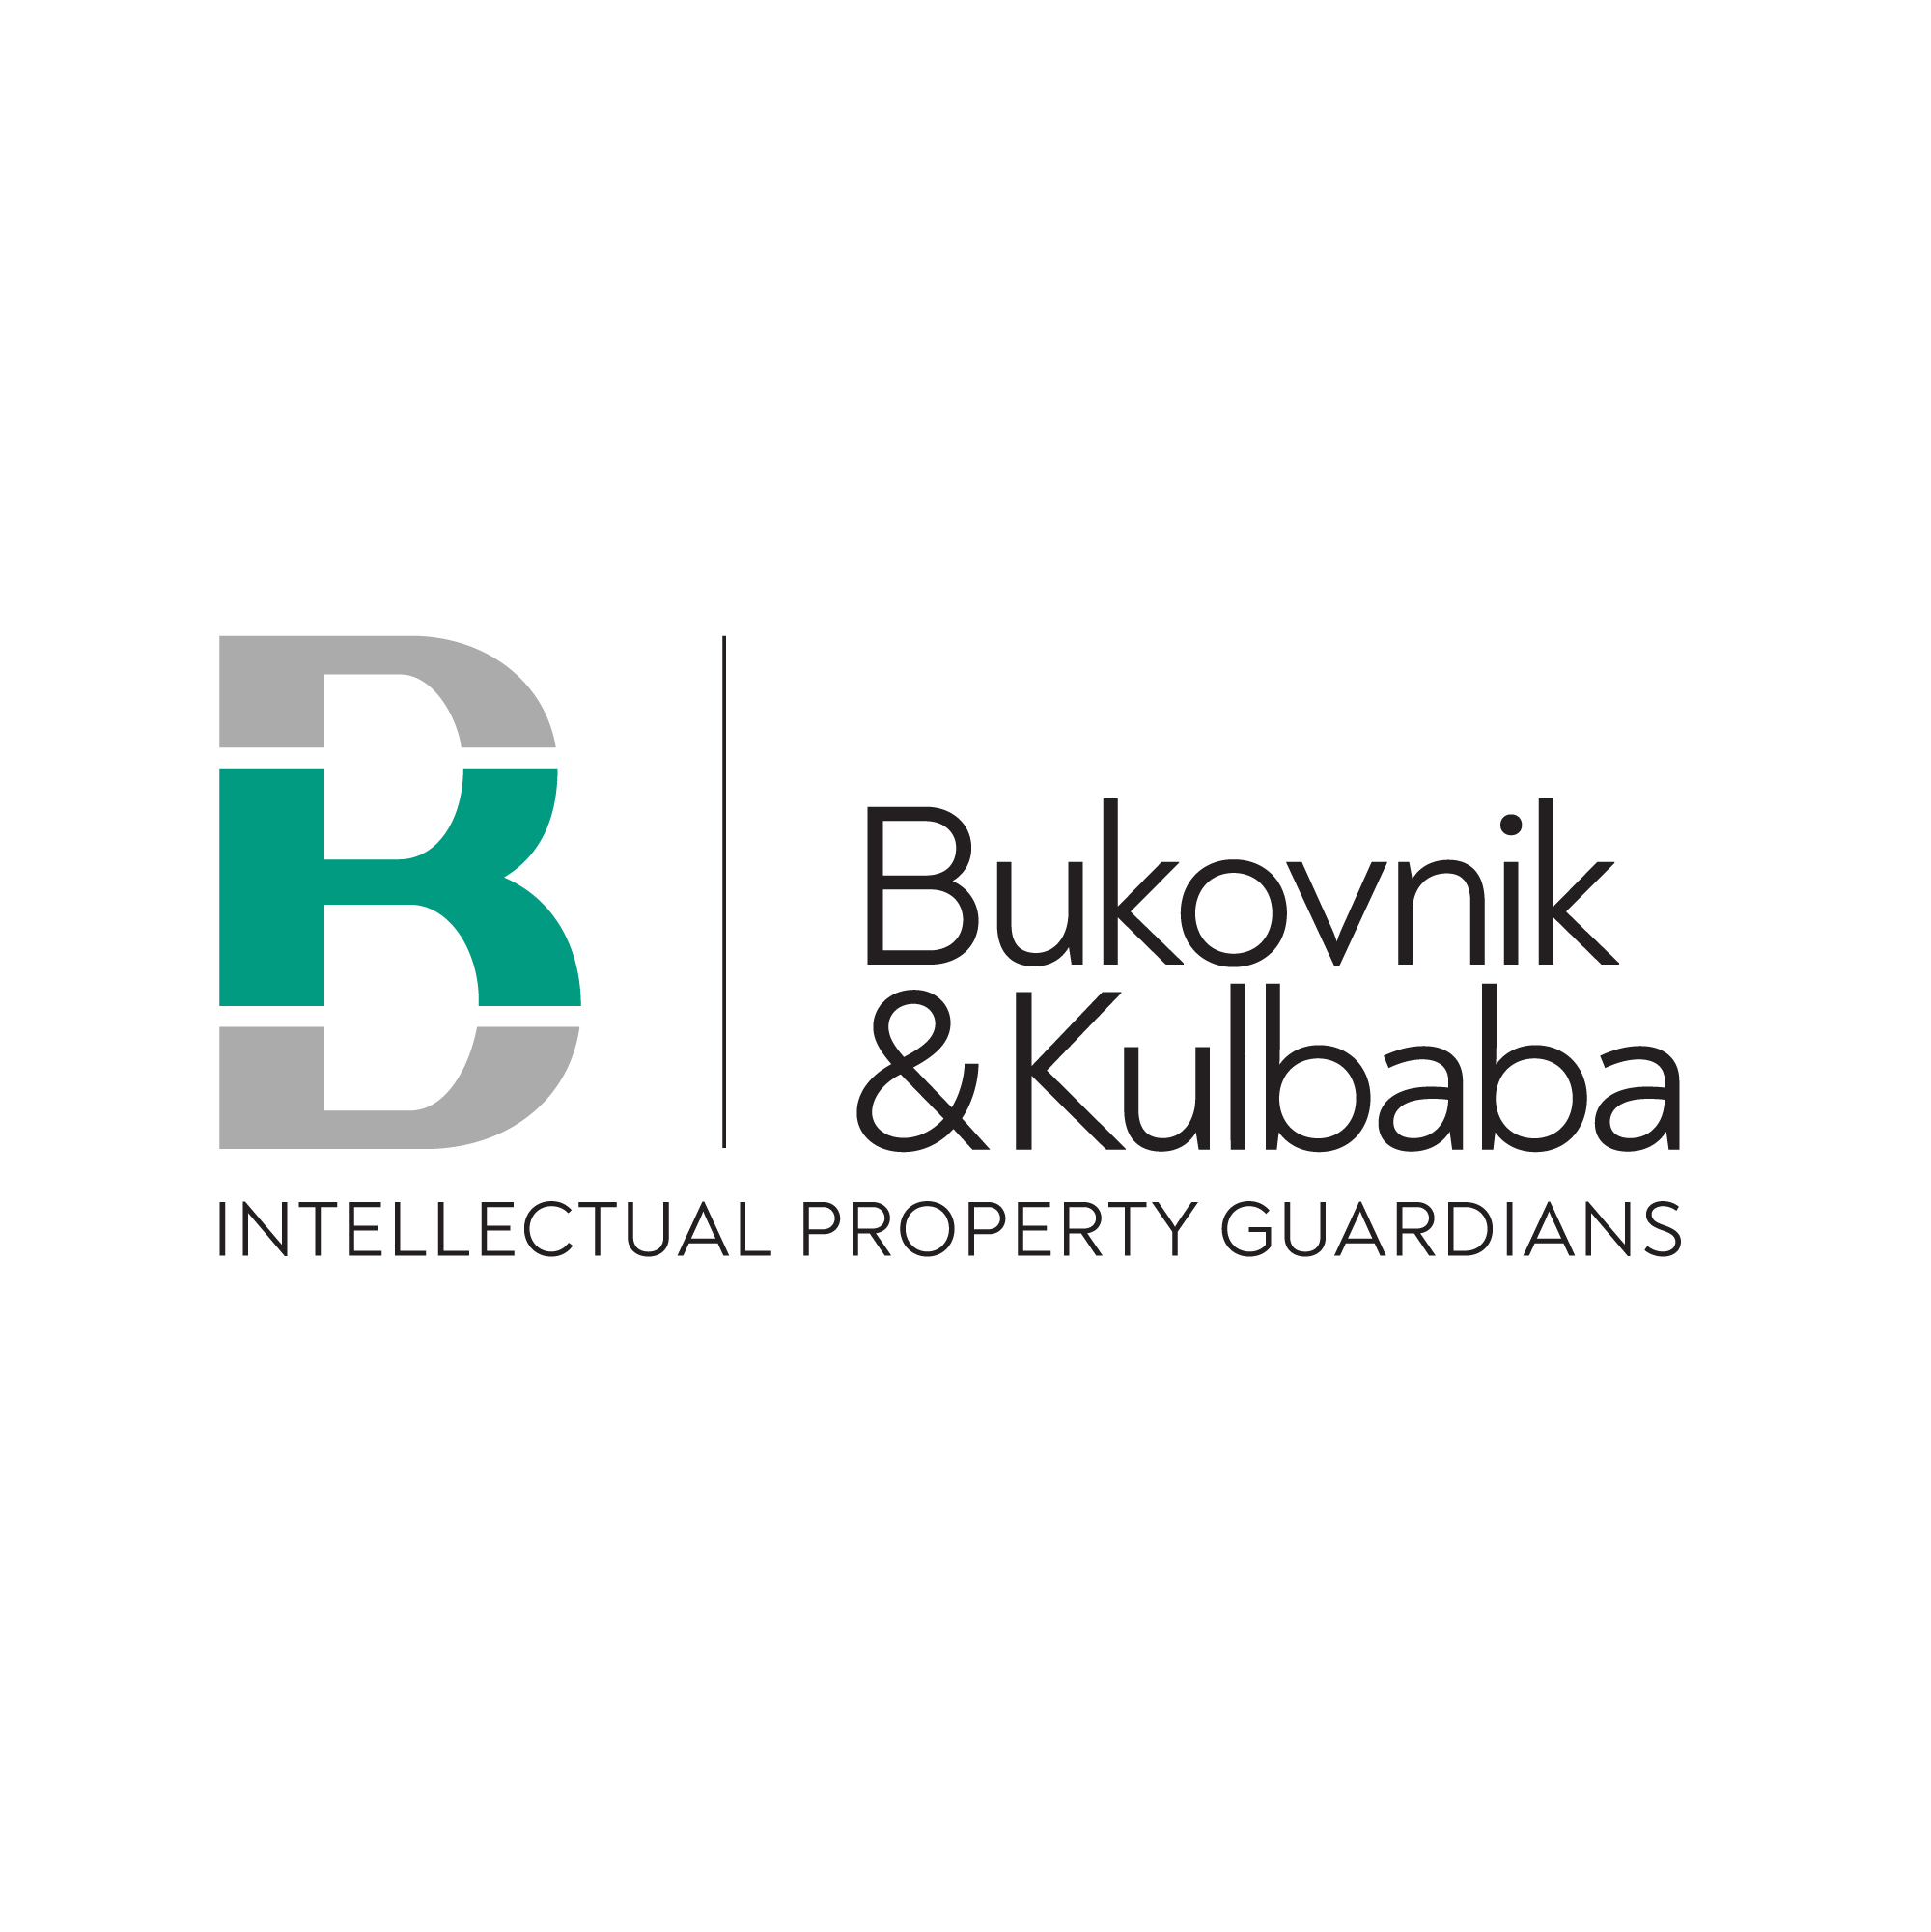 Bukovnik&Kulbaba Branding